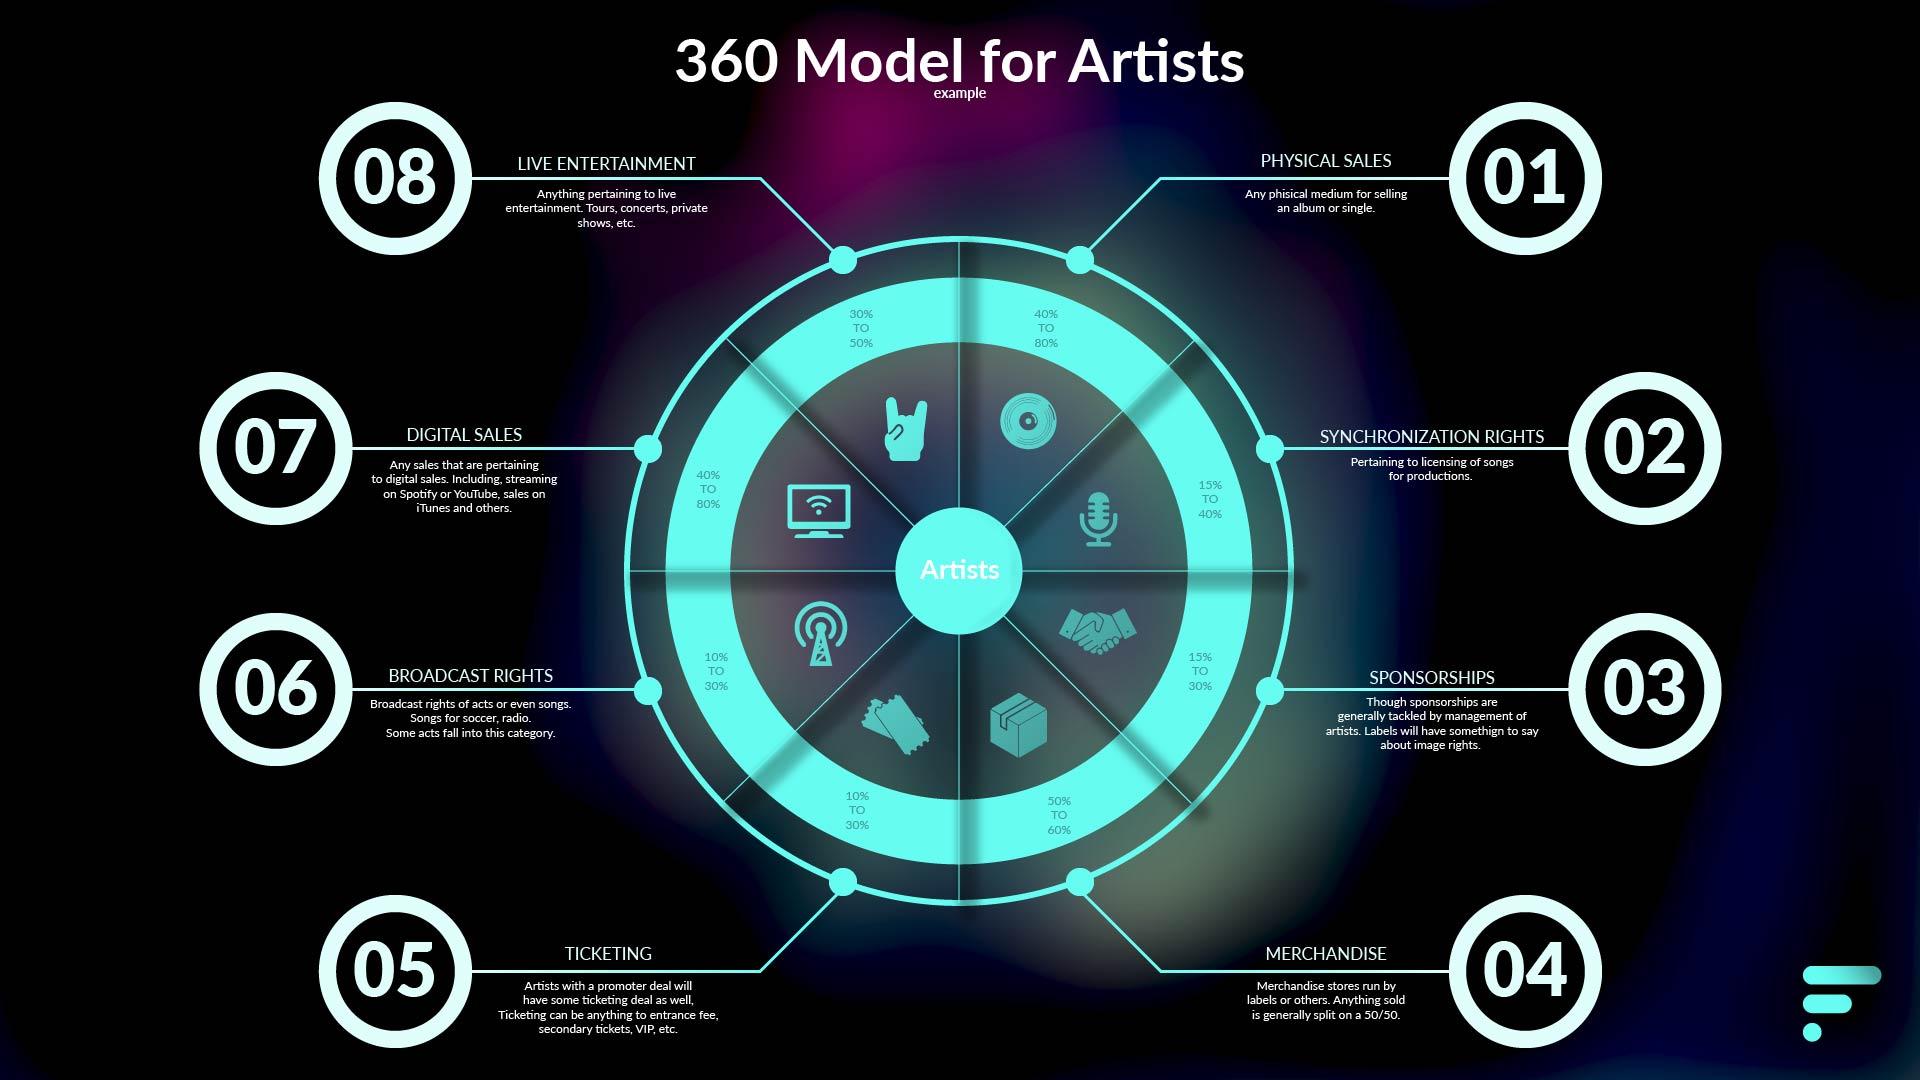 360 model for artists